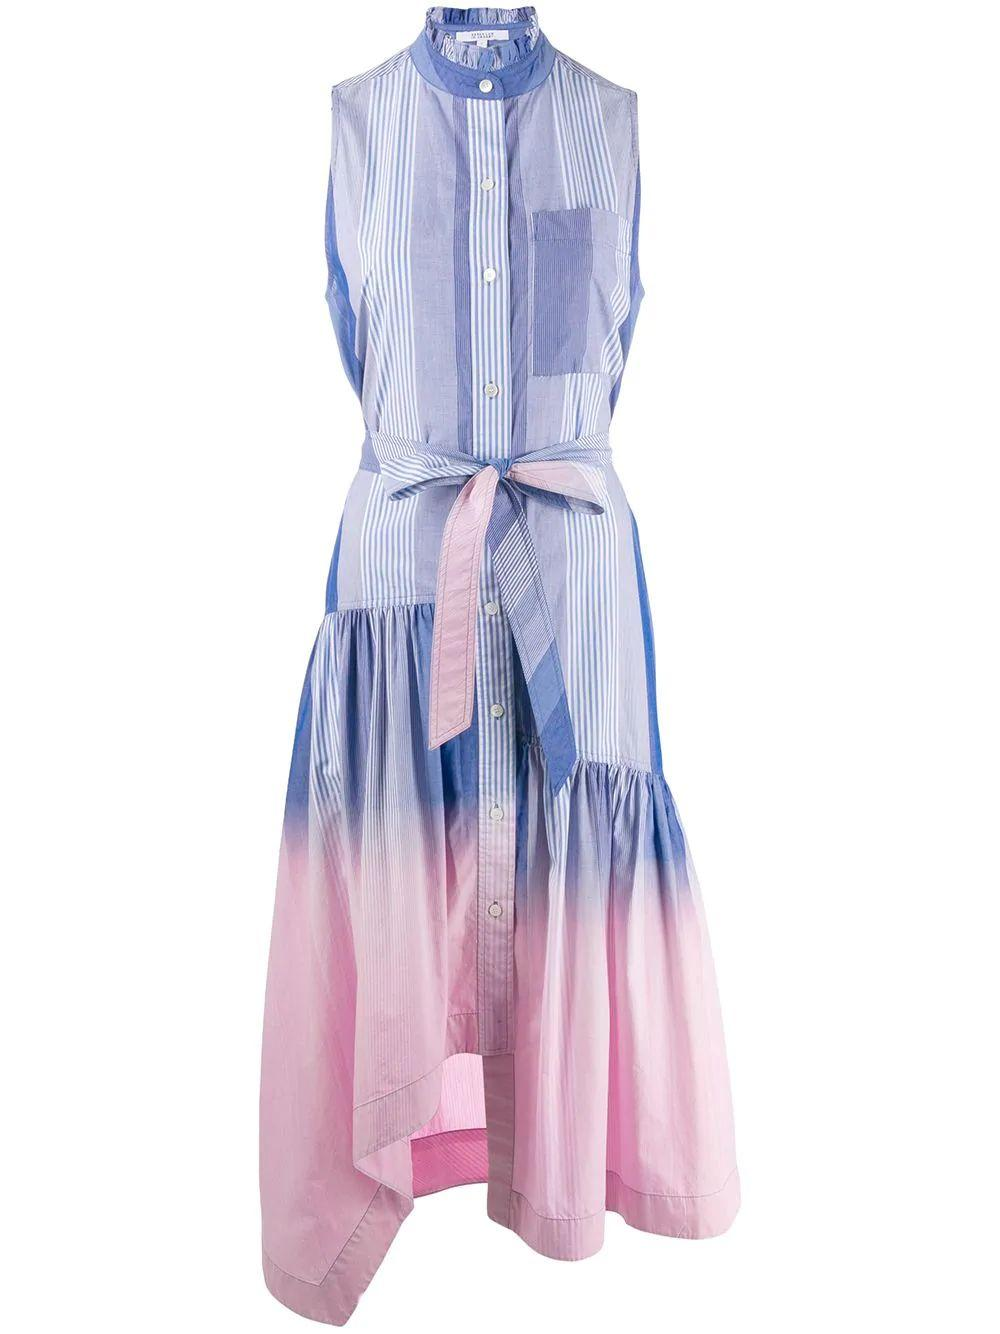 Nerioa Dip Dye Maxi Dress